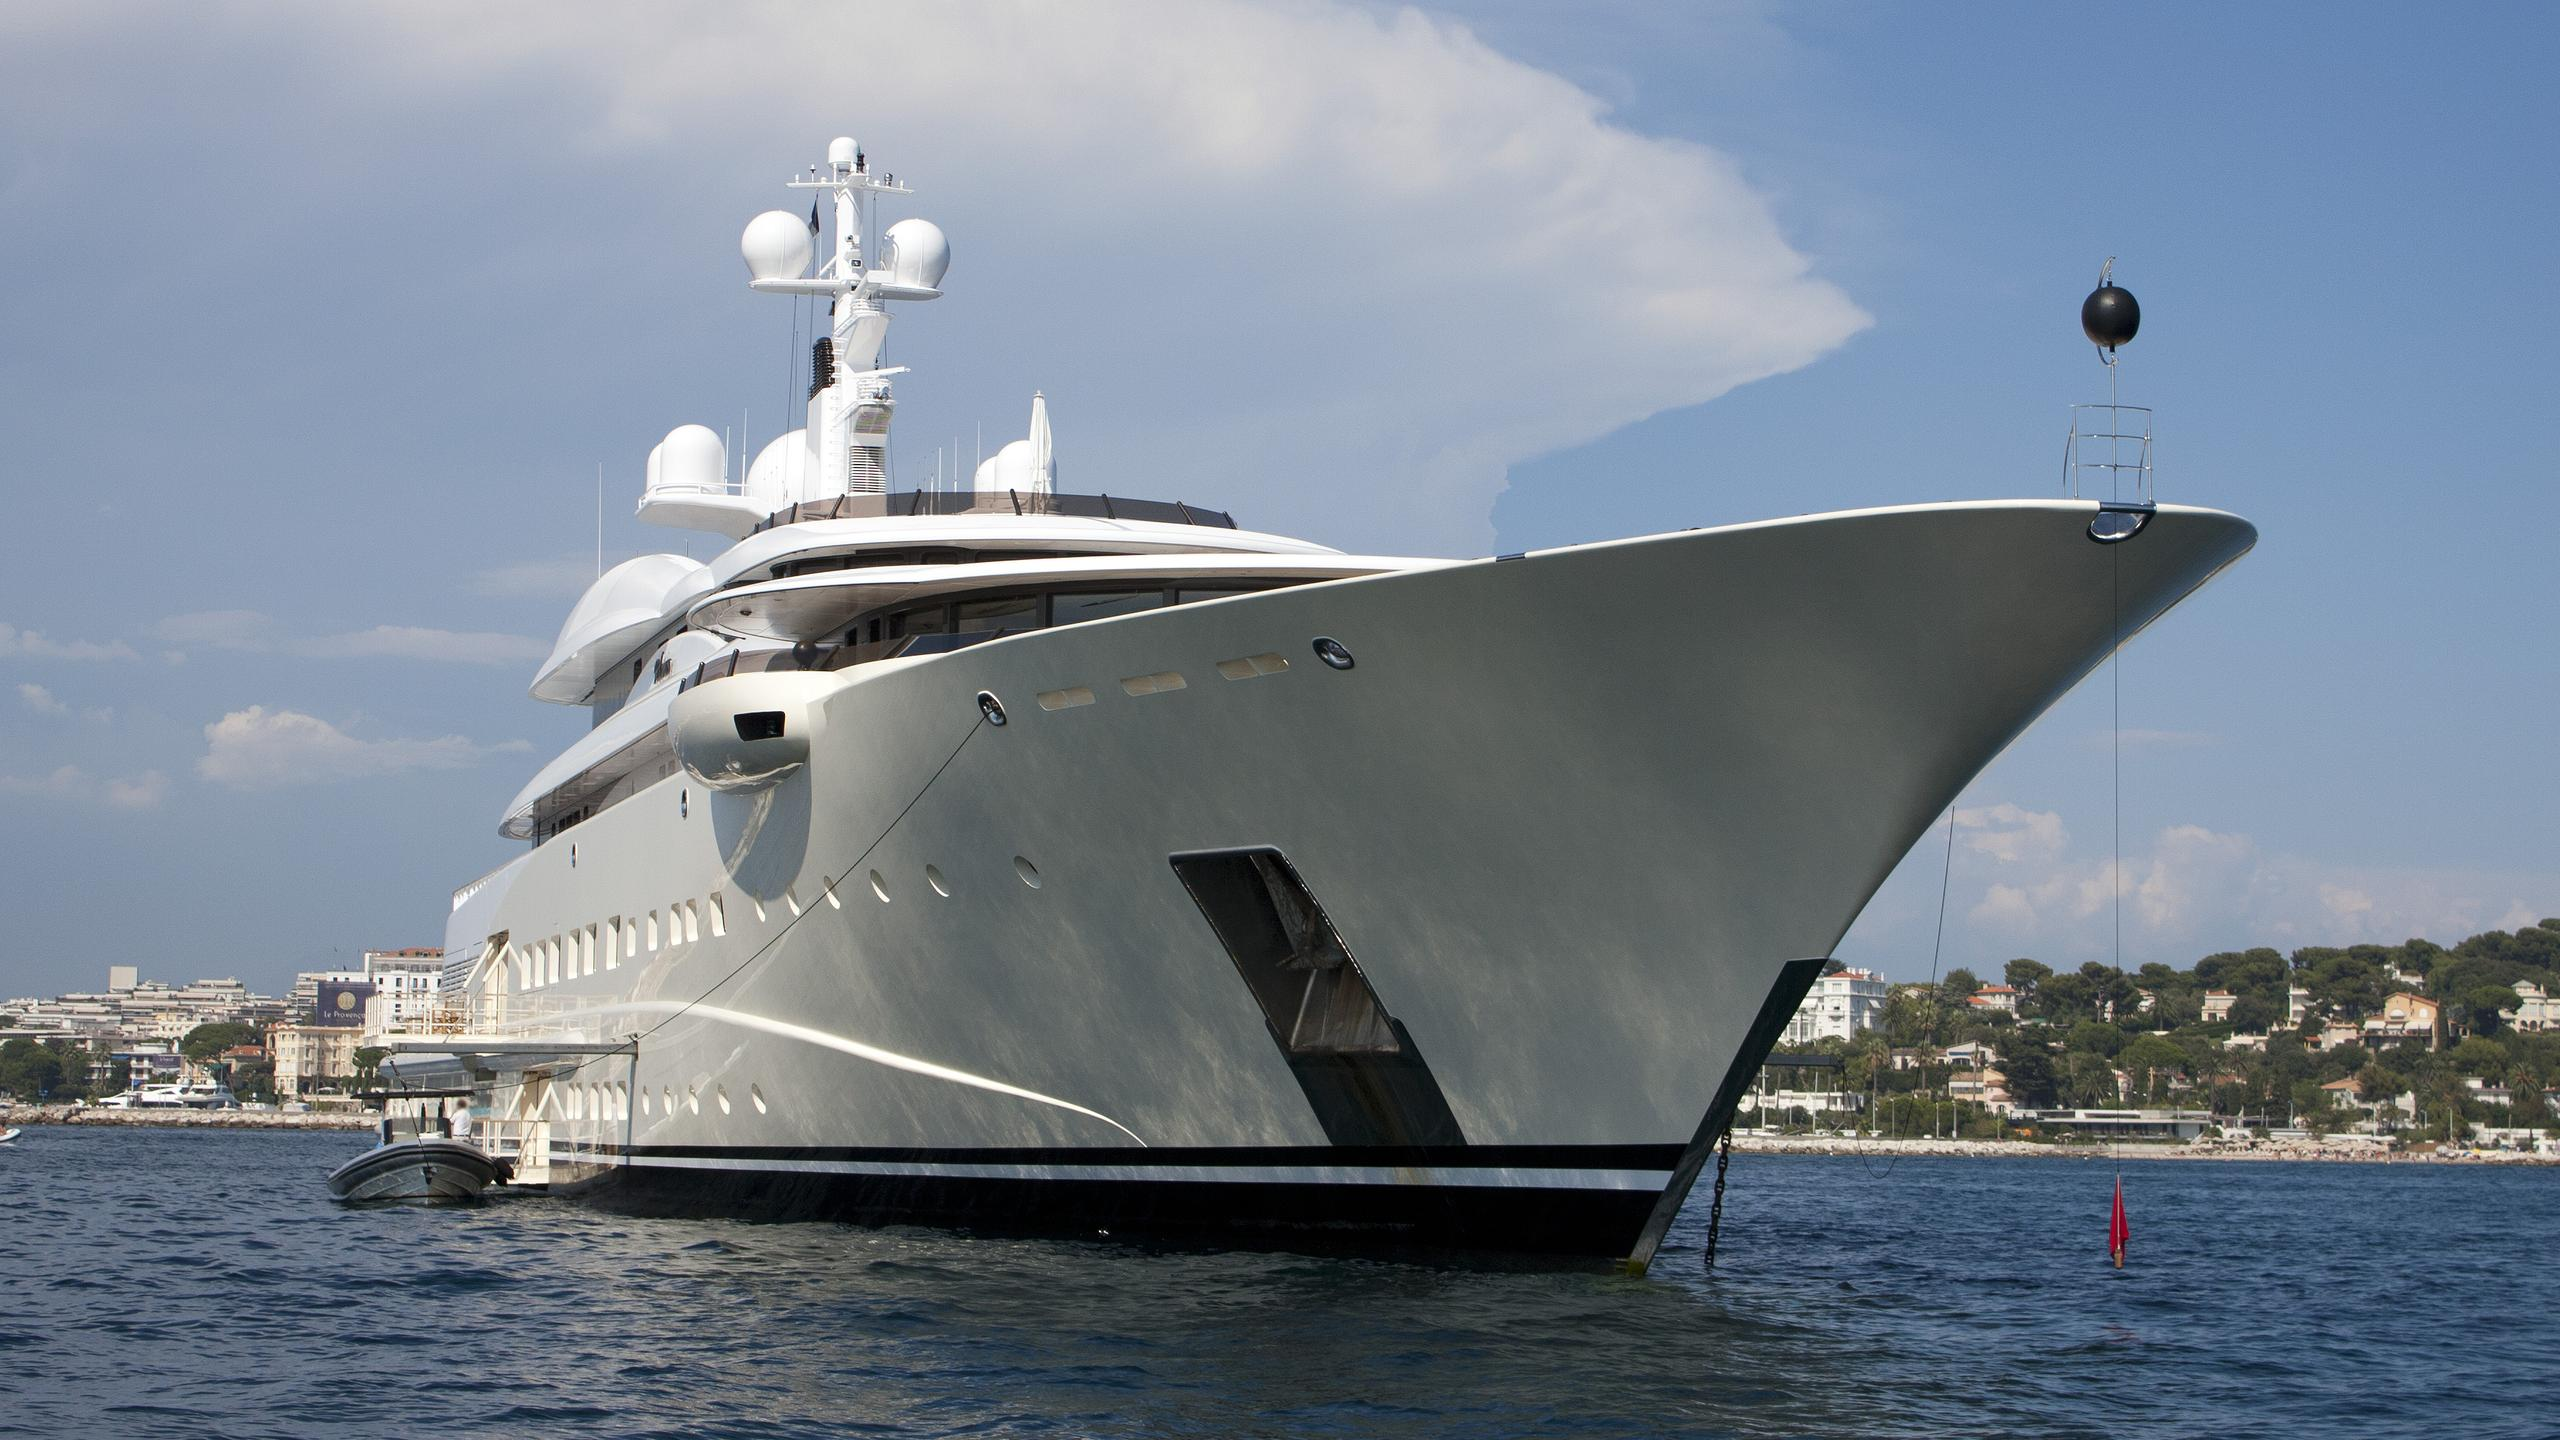 pelorus-motor-yacht-lurssen-2003-114m-half-profile